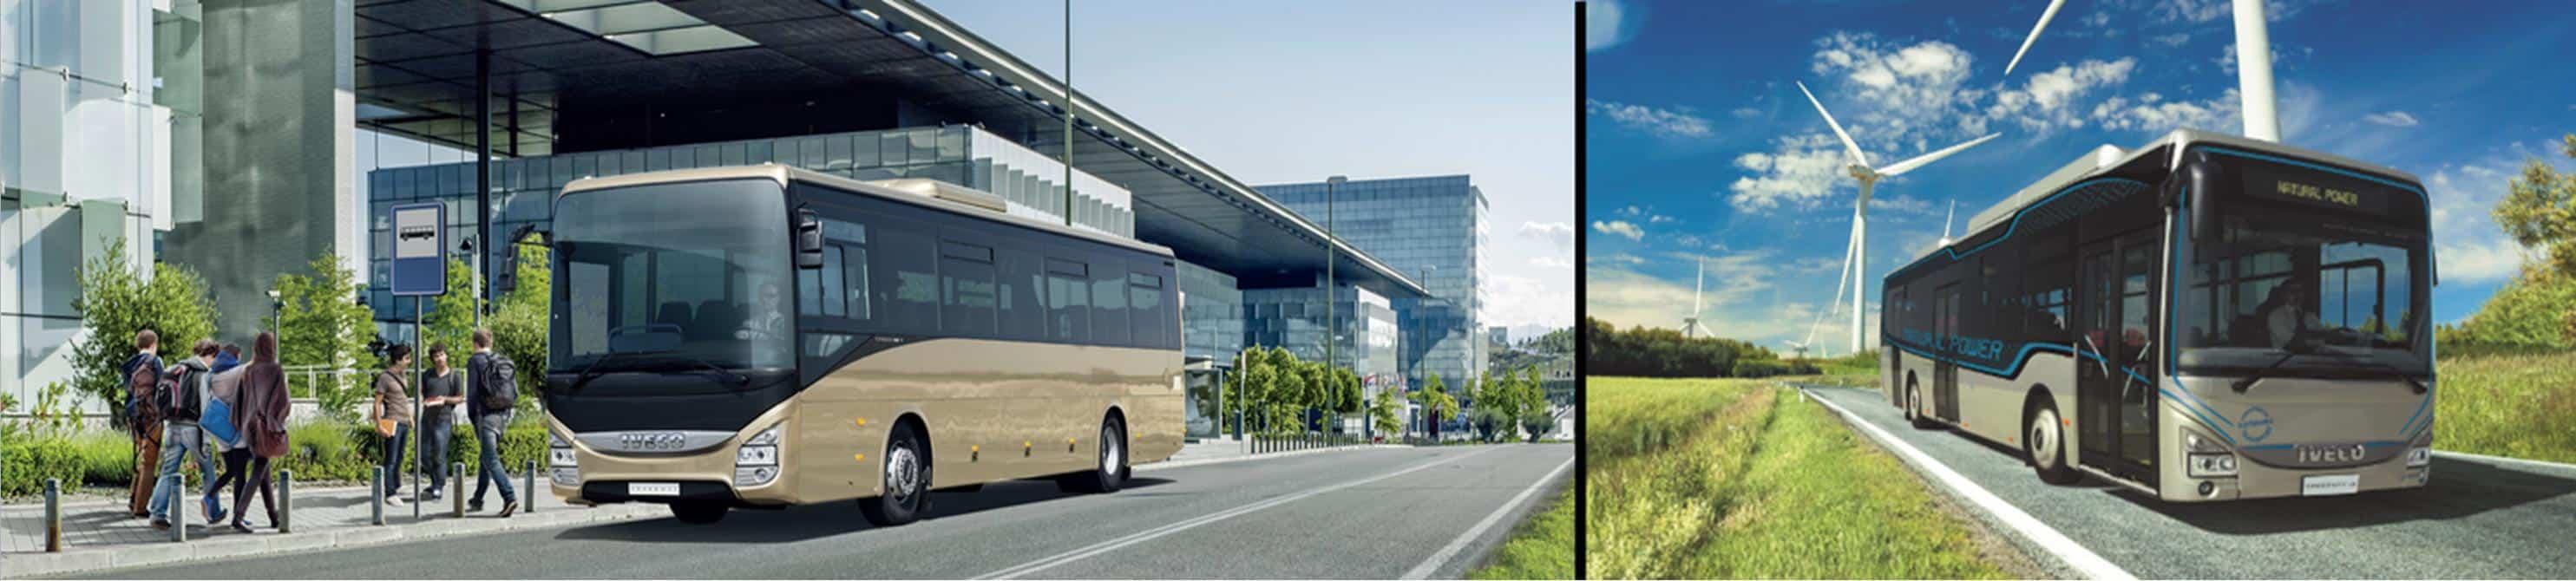 Concessionaria Iveco Orecchia bus